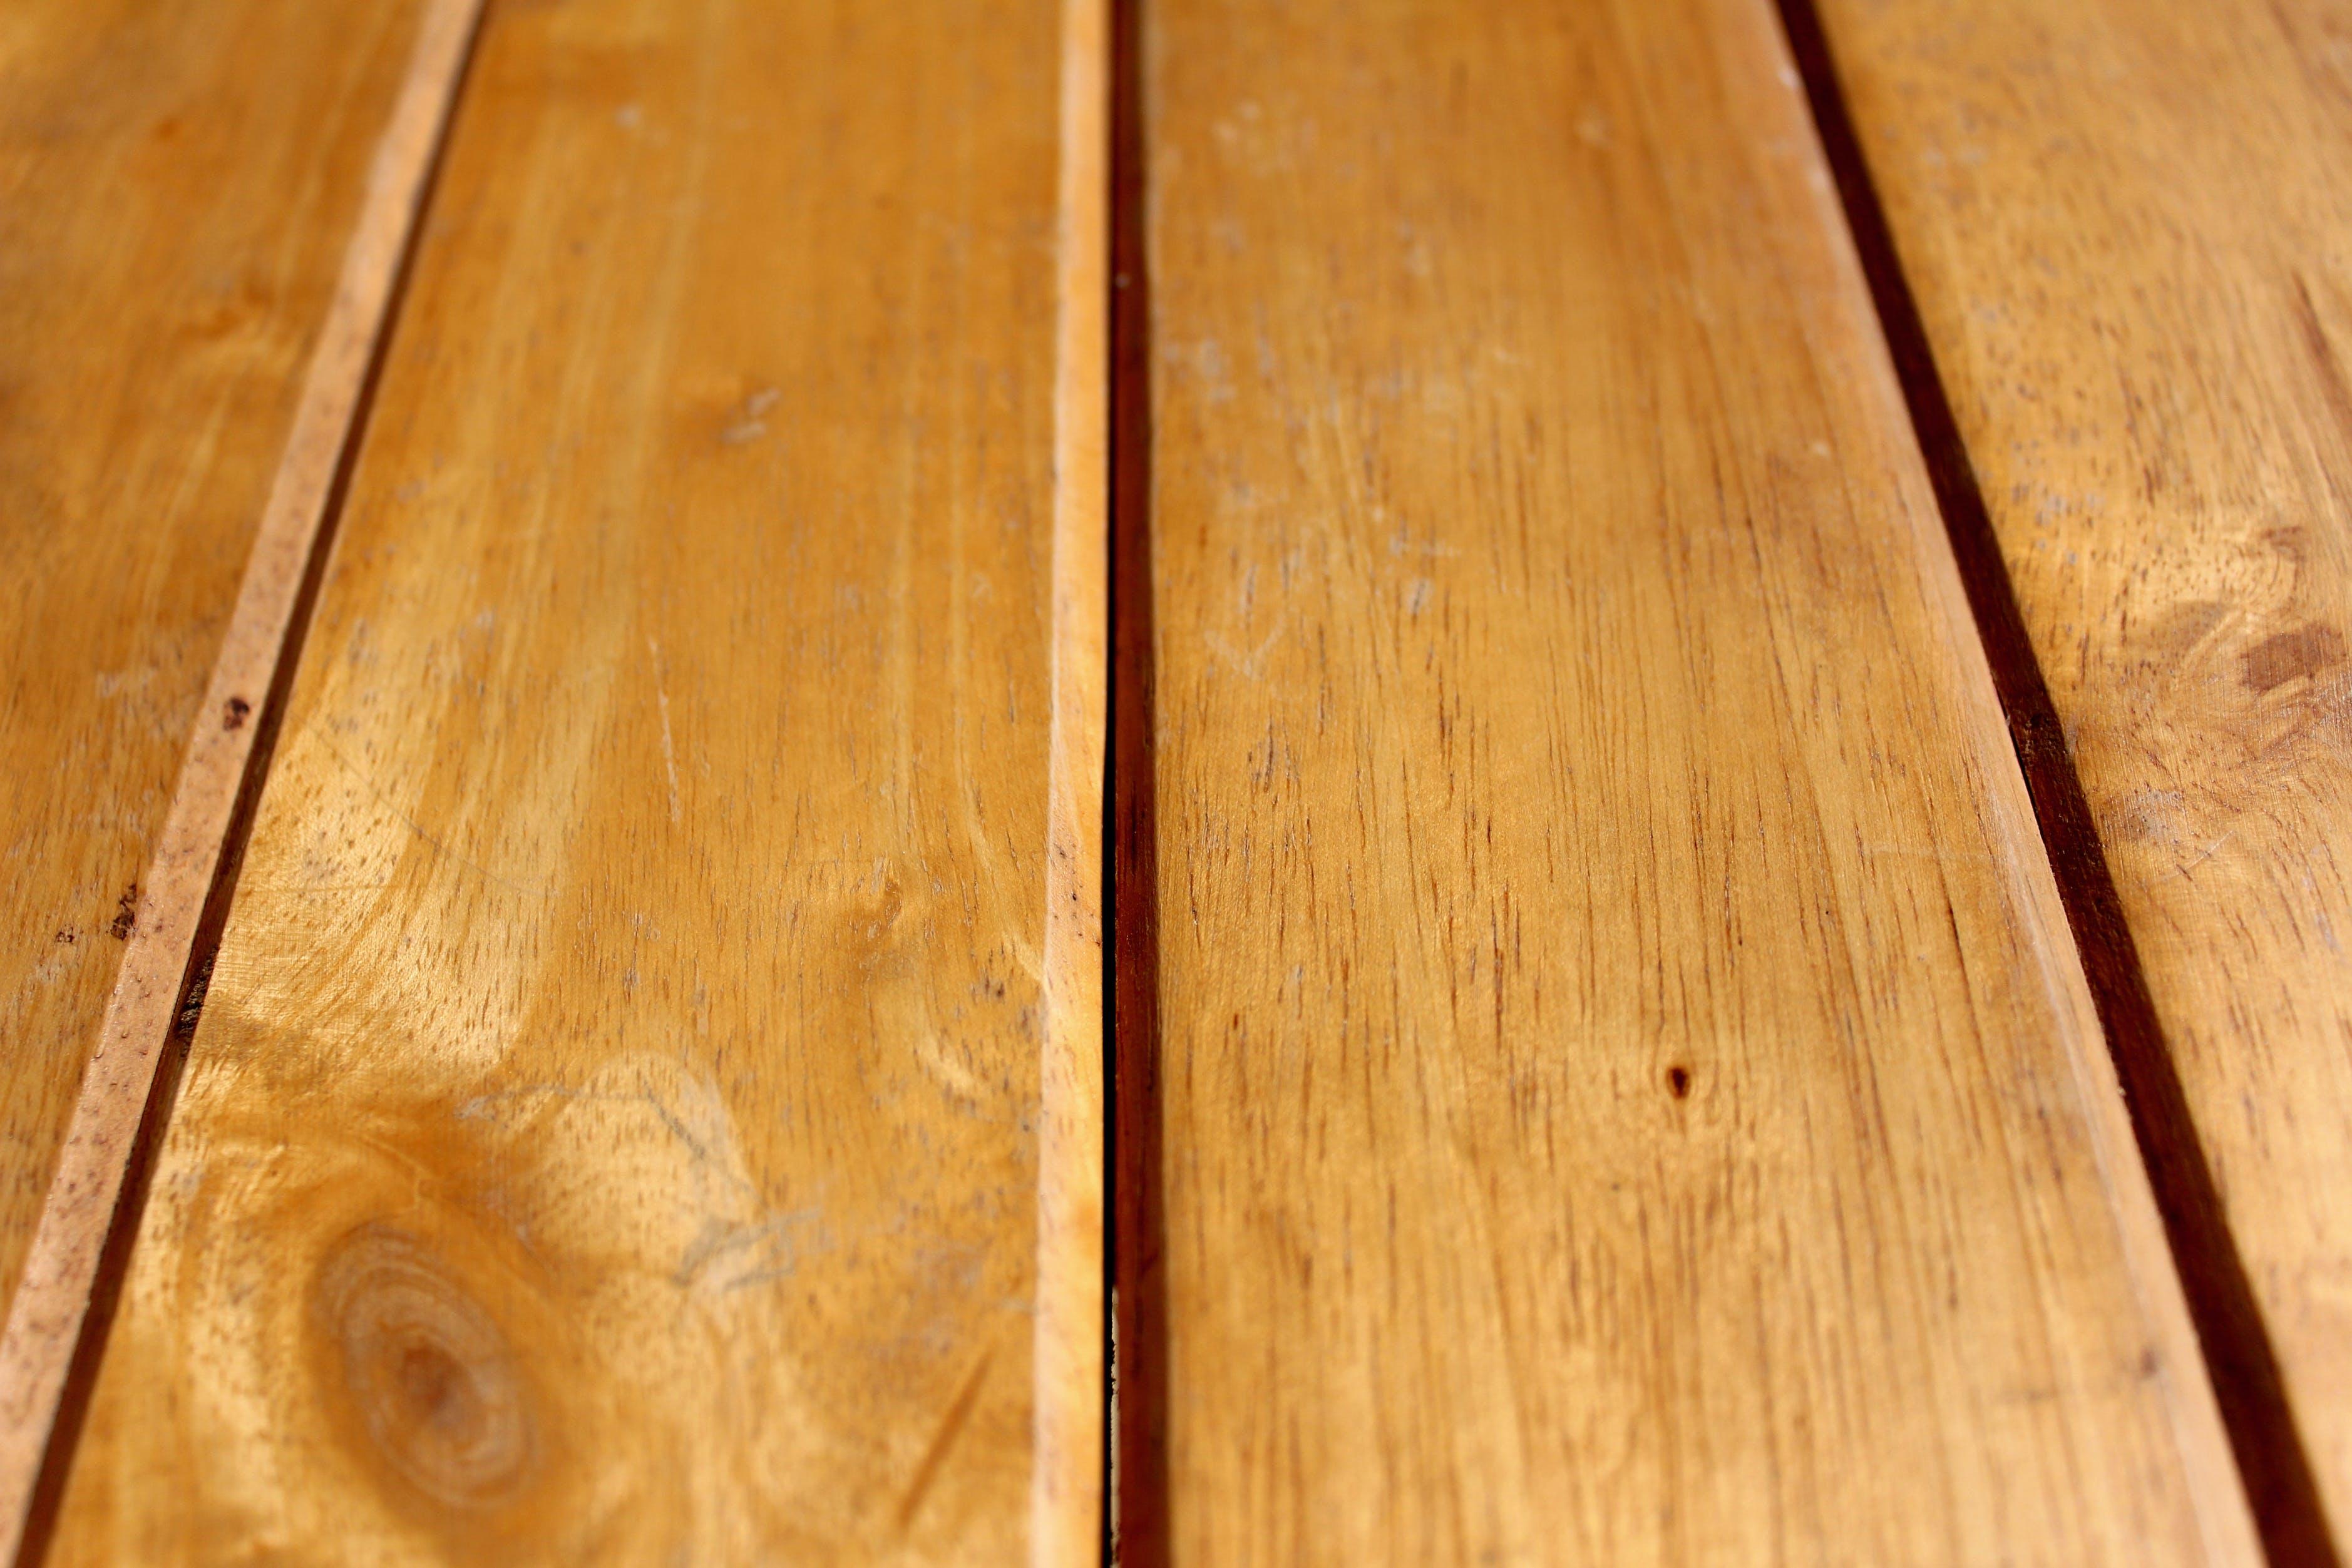 close-up, hardwood, planks